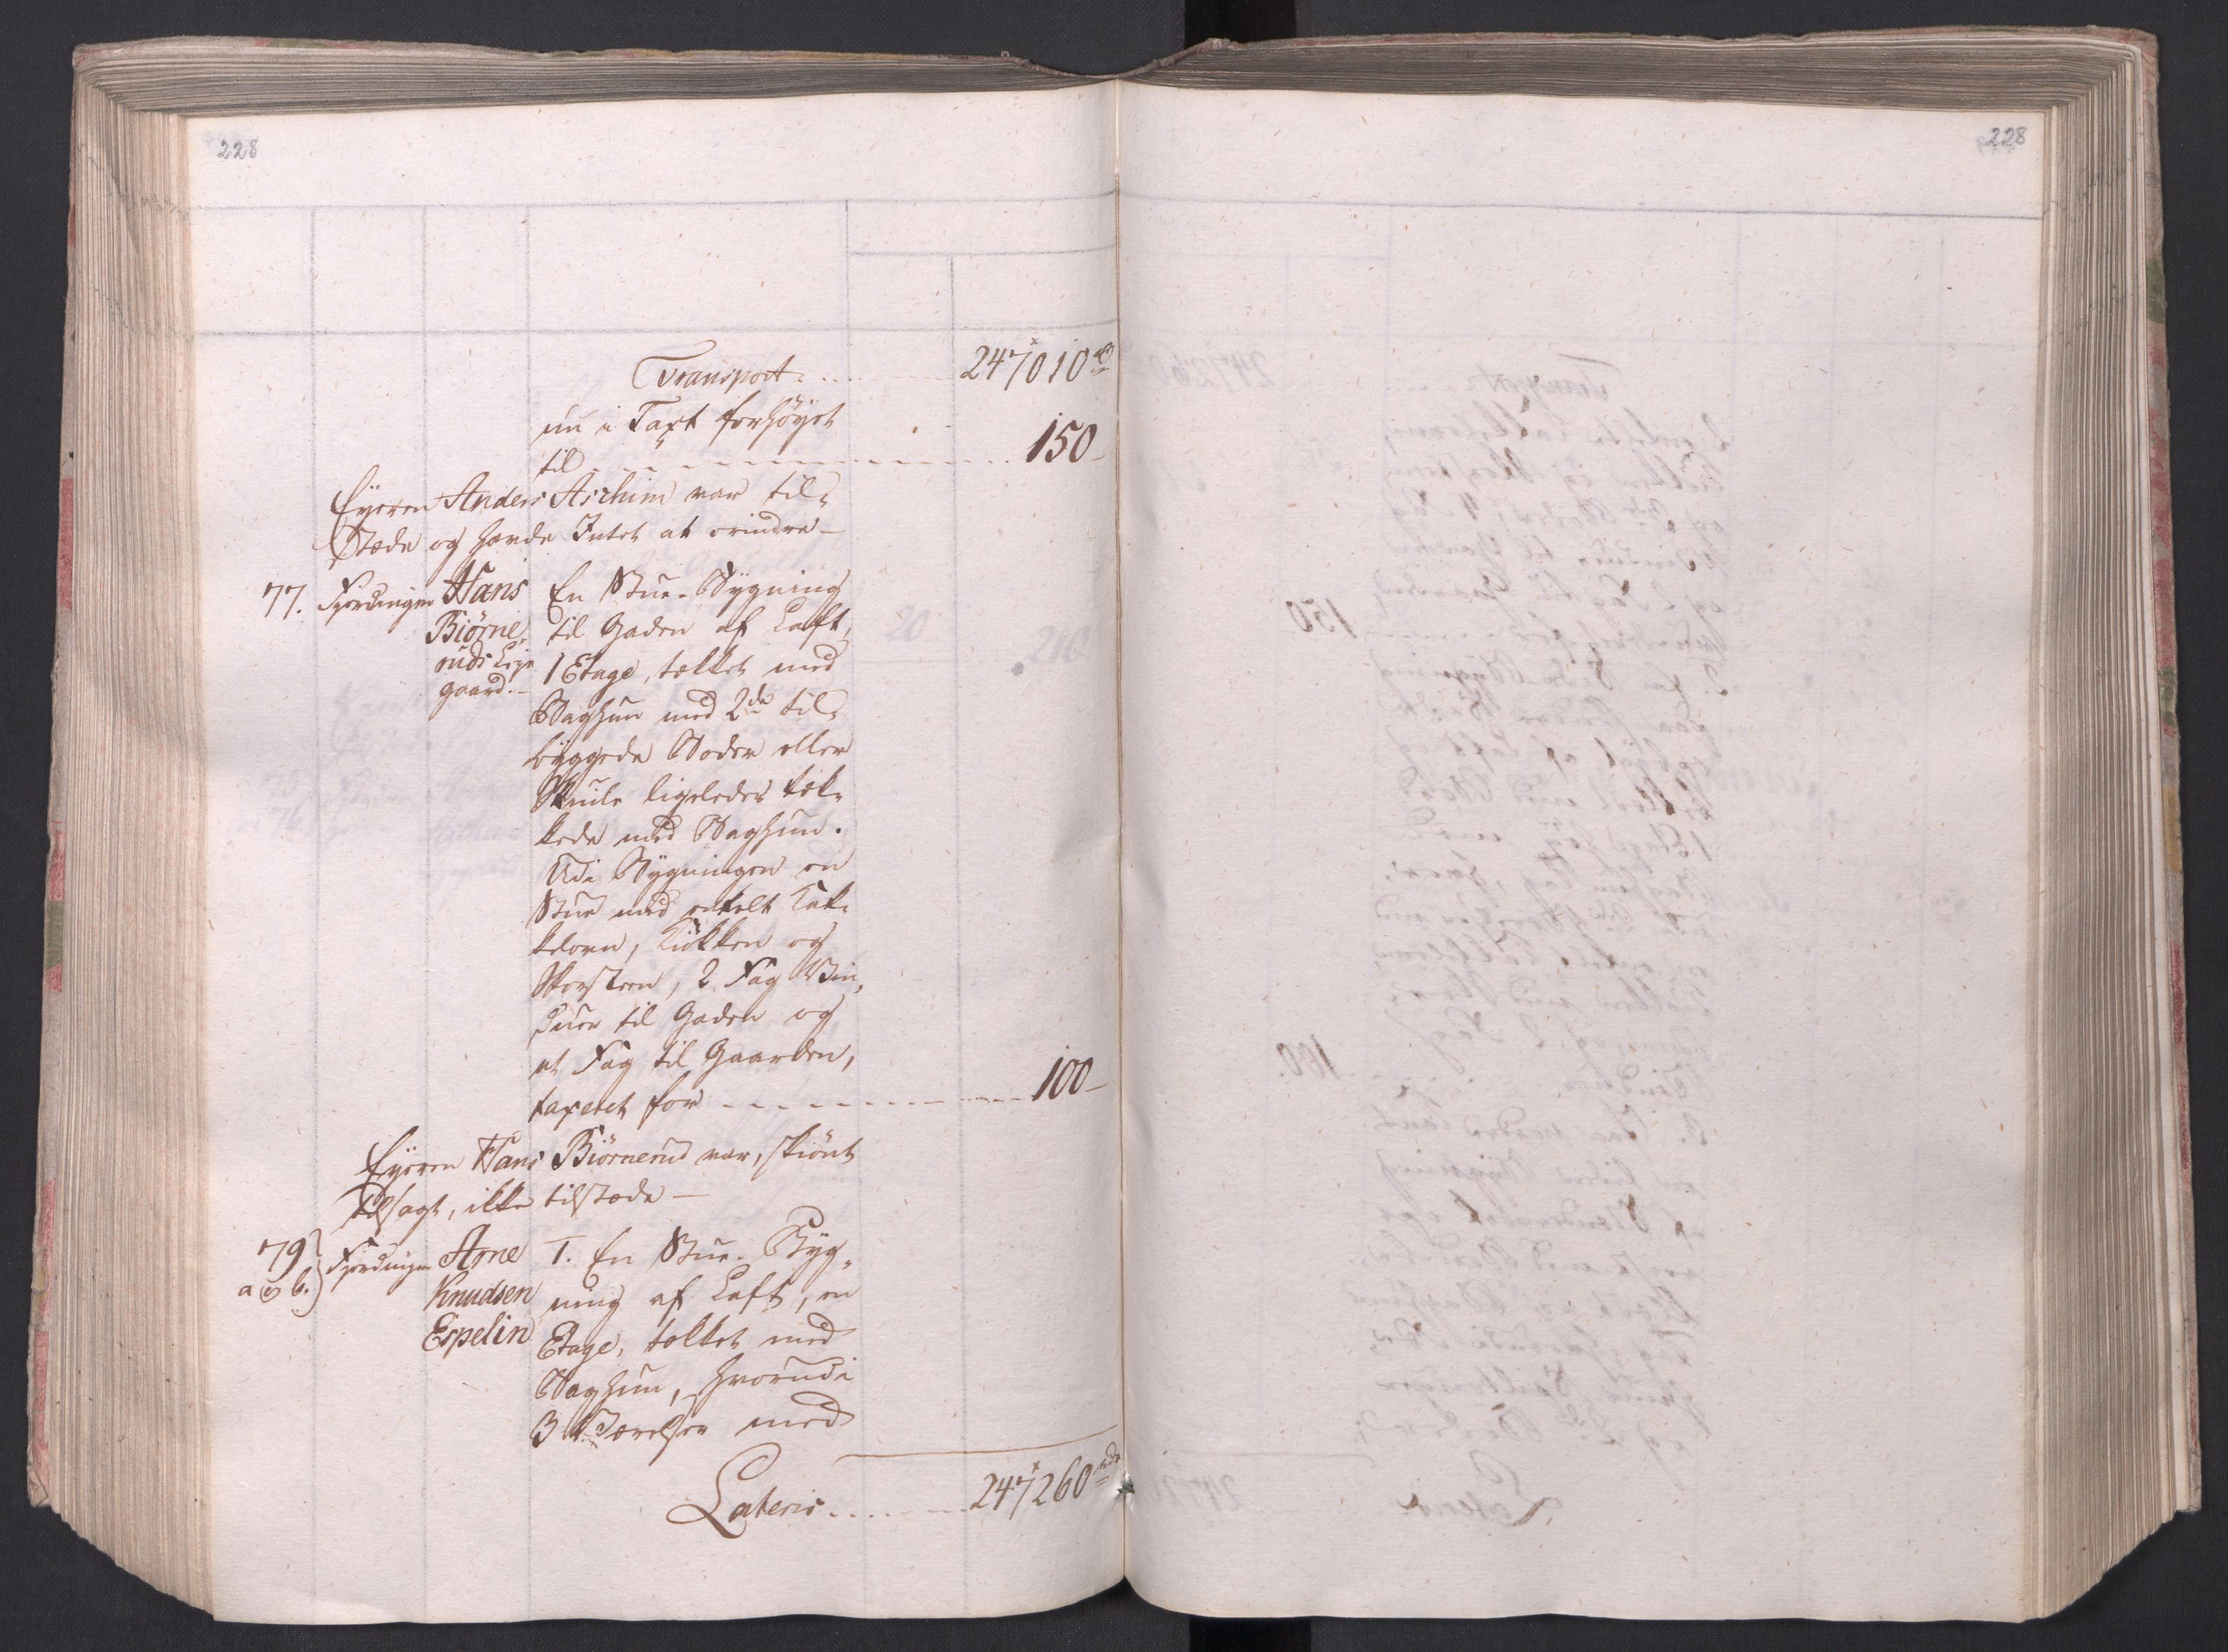 SAO, Kristiania stiftamt, I/Ia/L0015: Branntakster, 1797, s. 228